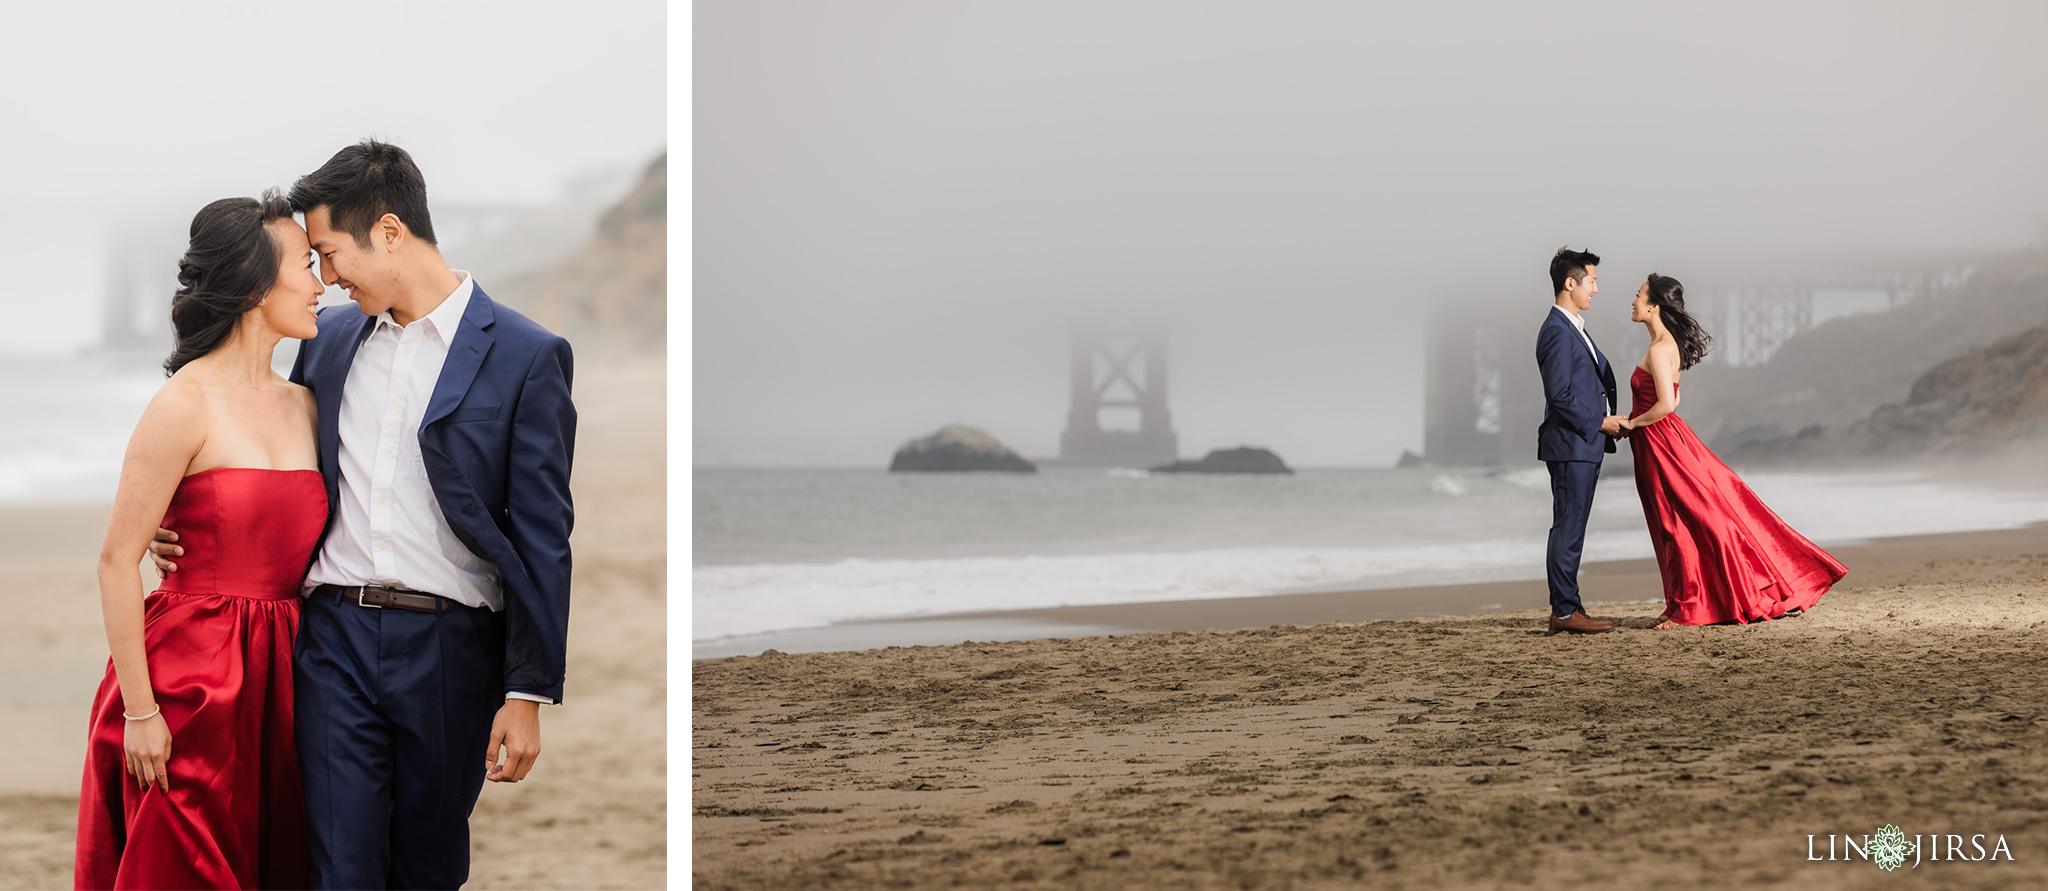 06 Lands End Trail Karl the Fog San Francisco Engagement Photography